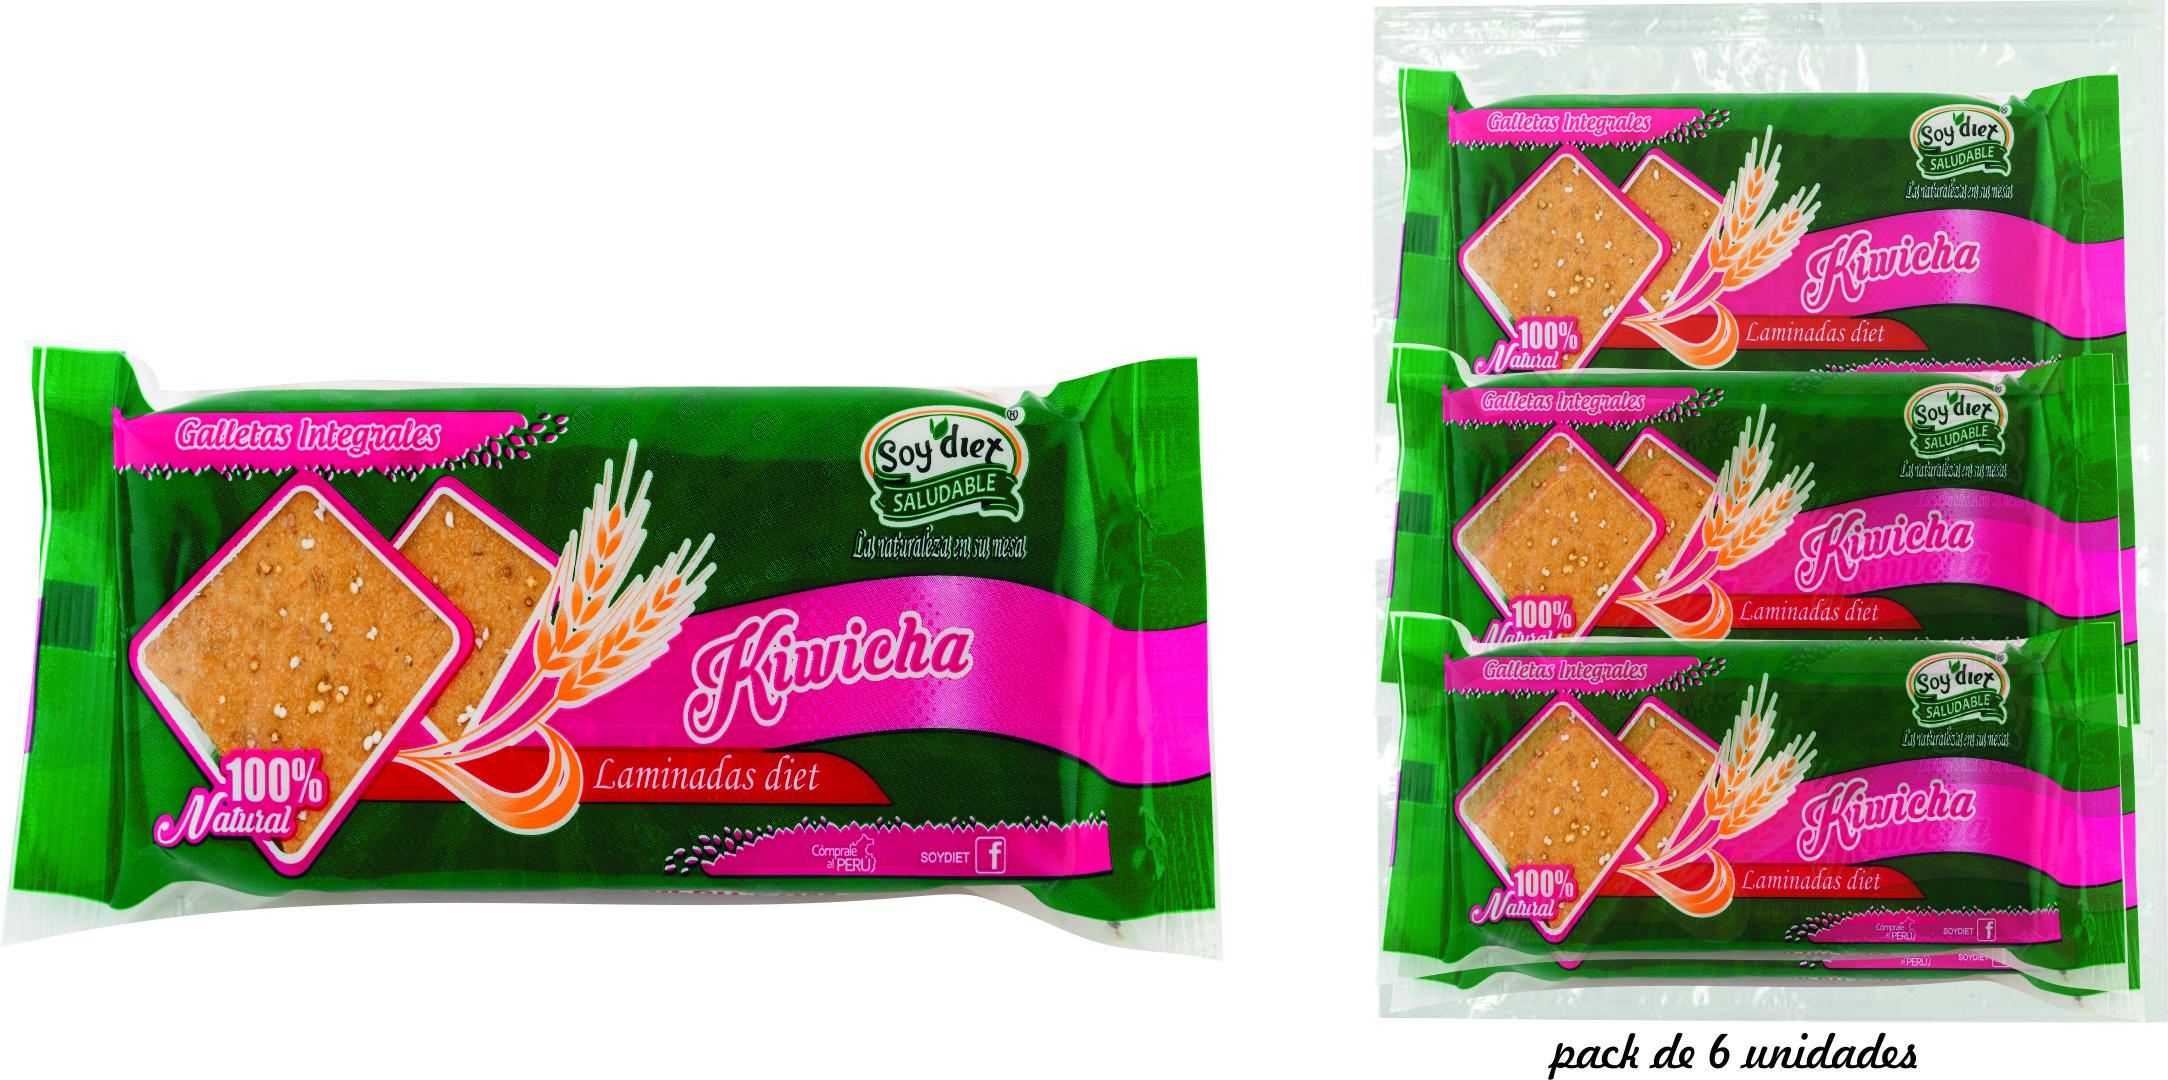 laminadas-diet-kiwicha